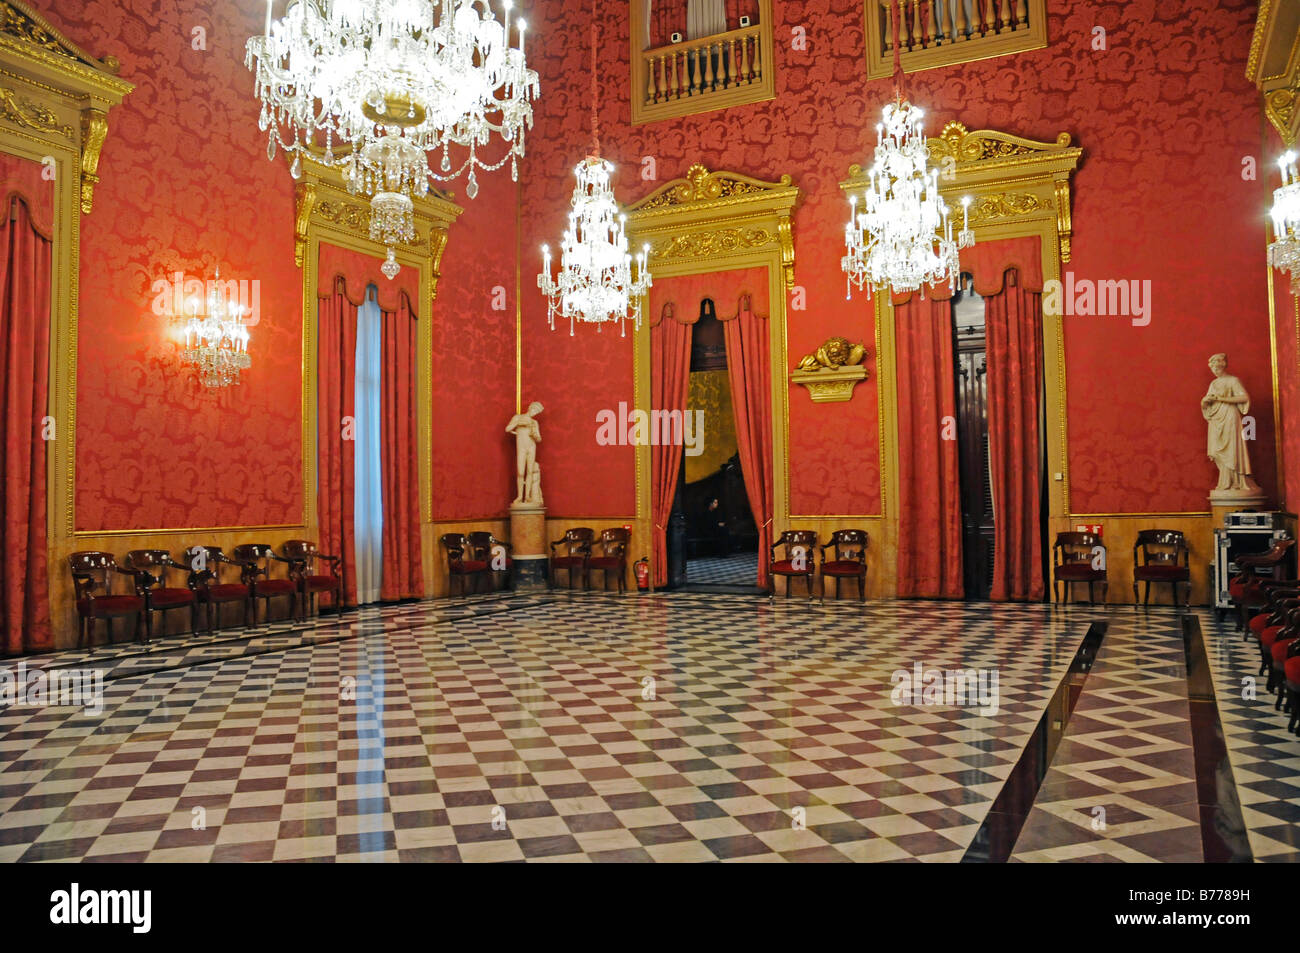 The Golden Parlour, hall, Palacio de la Llotja de Mar, former stock exchange, Barcelona, Catalonia, Spain, Europe Stock Photo